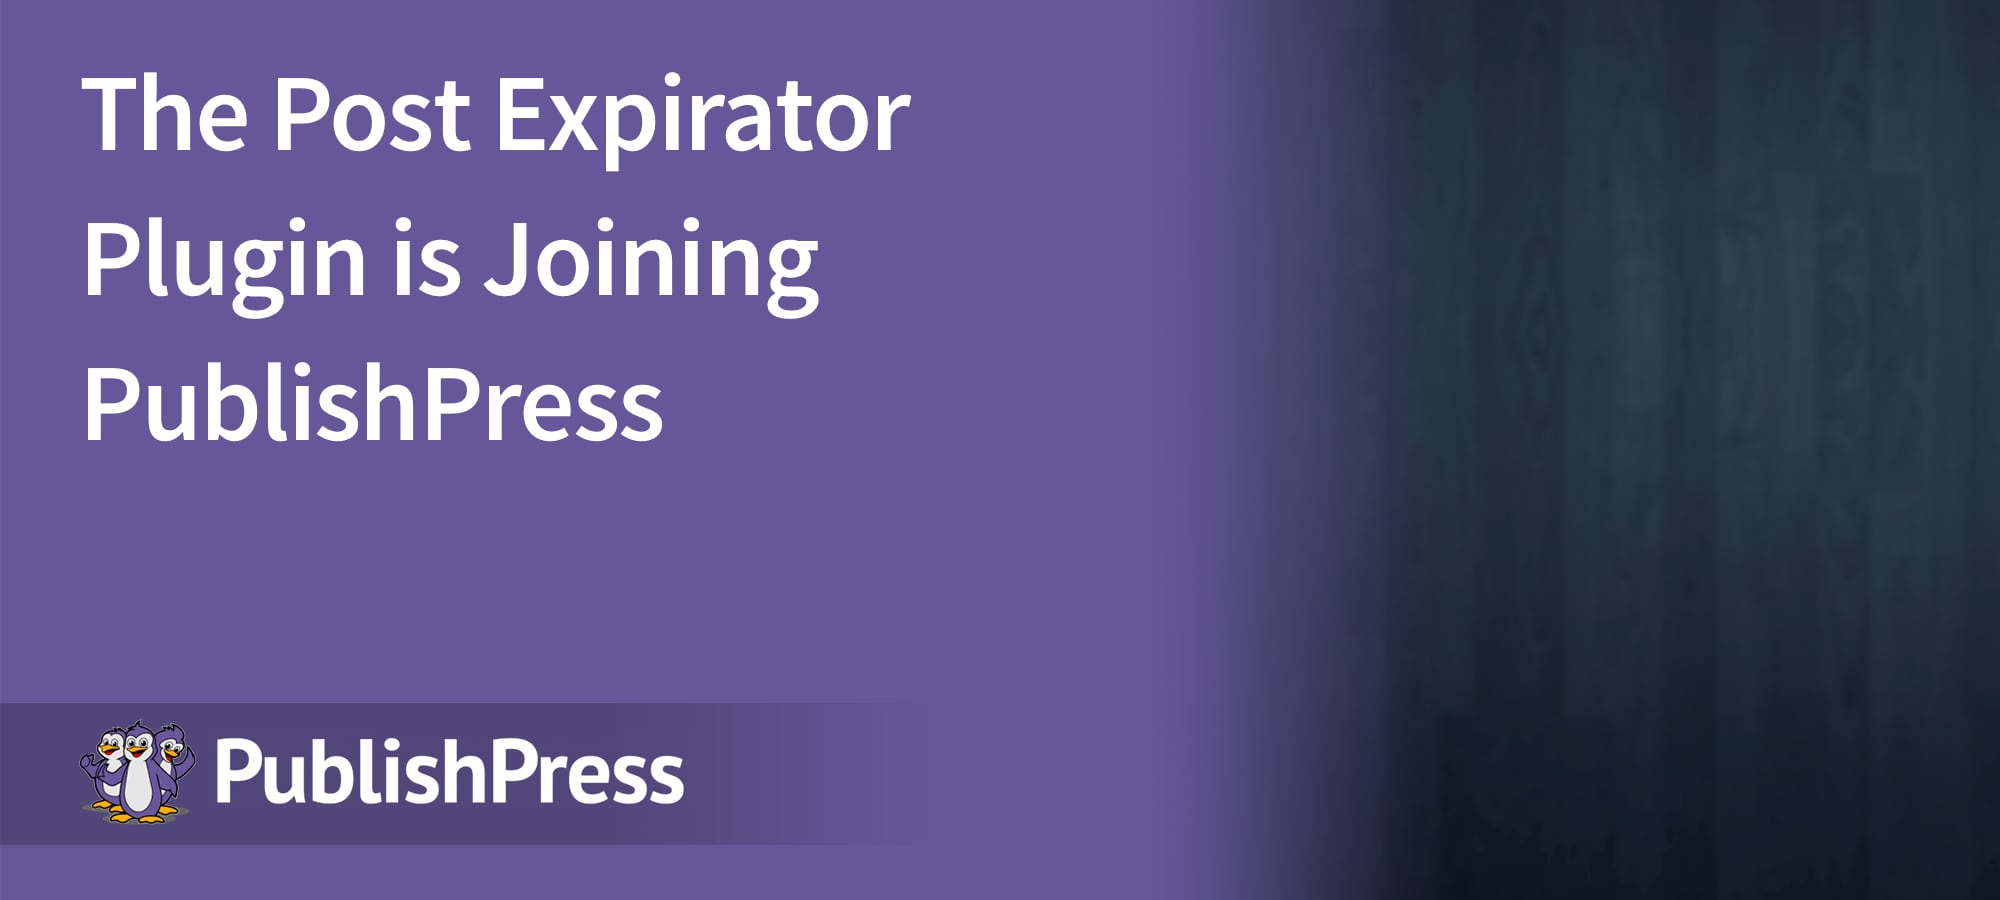 Post Expirator Header